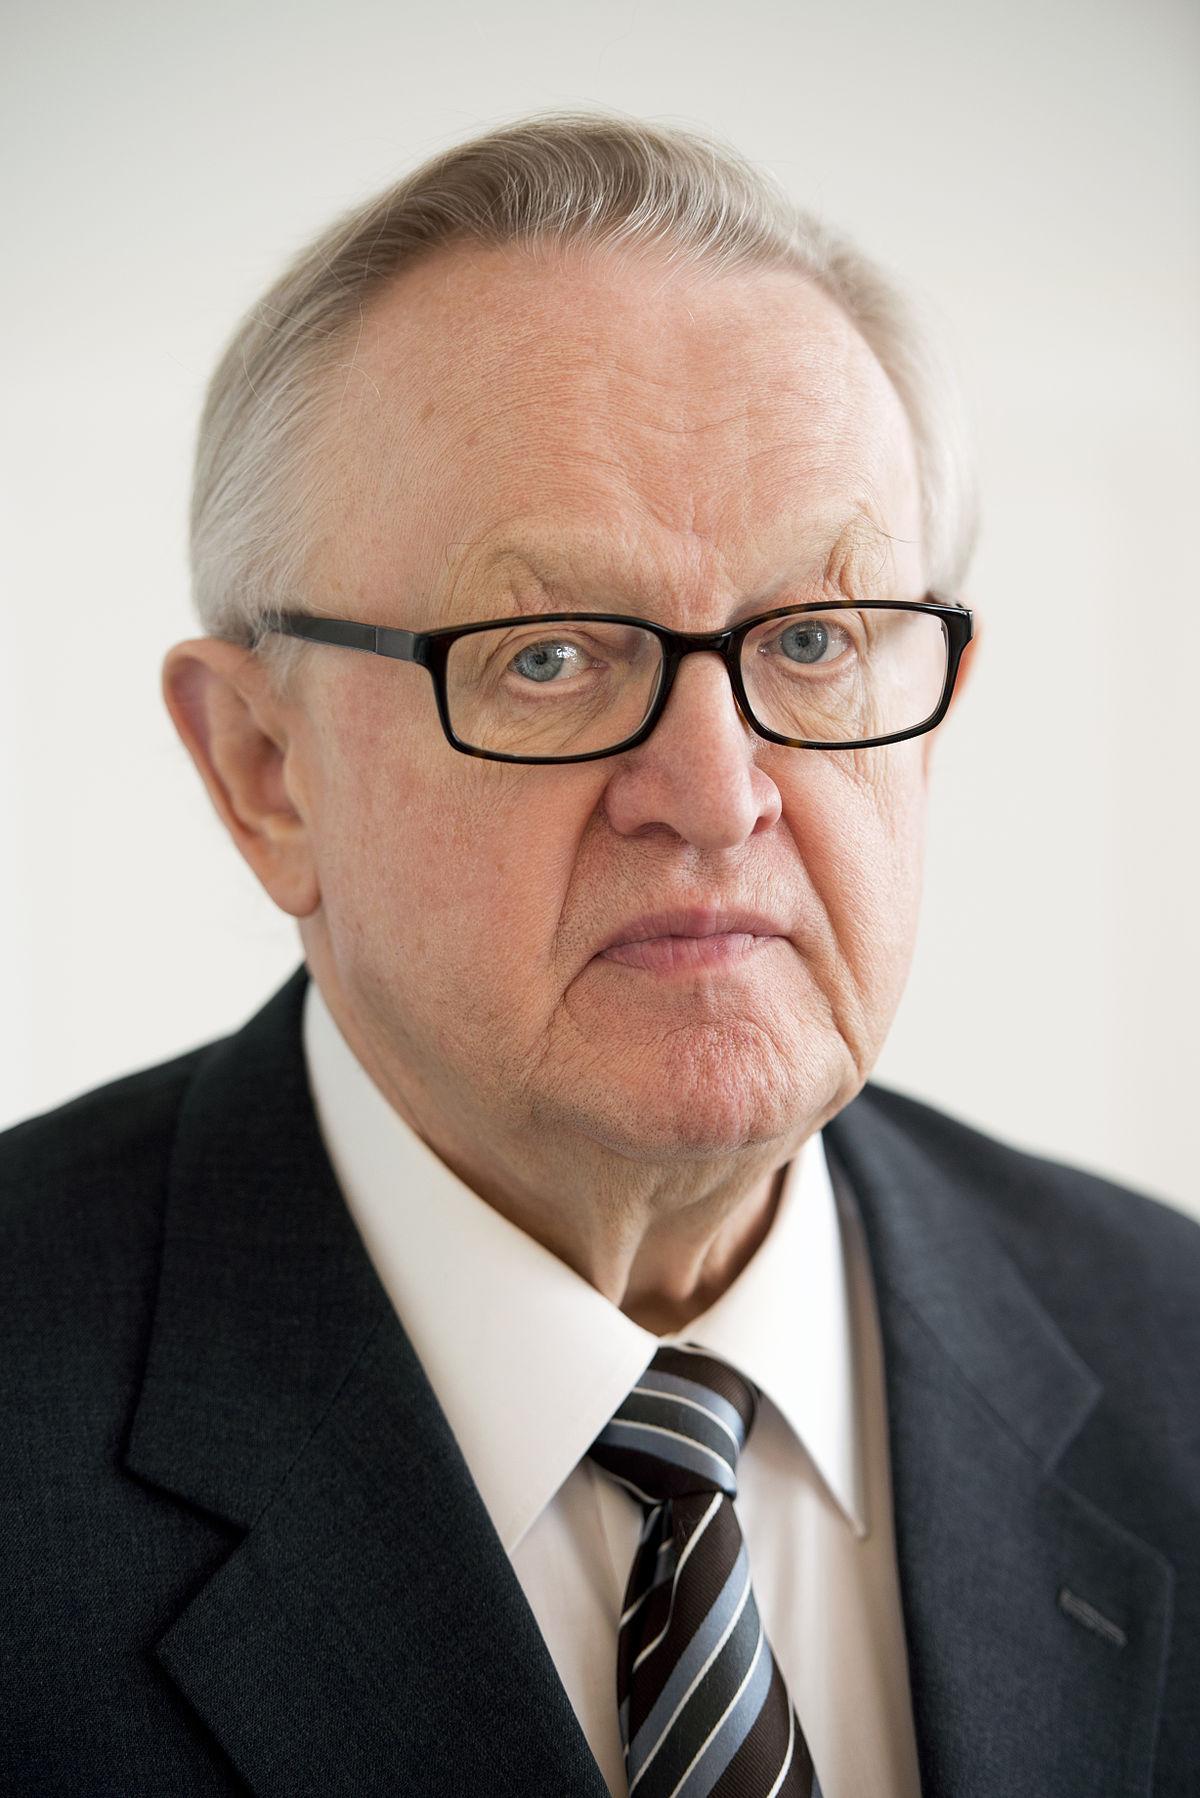 Massiv kritik mot ministerns betygsforslag